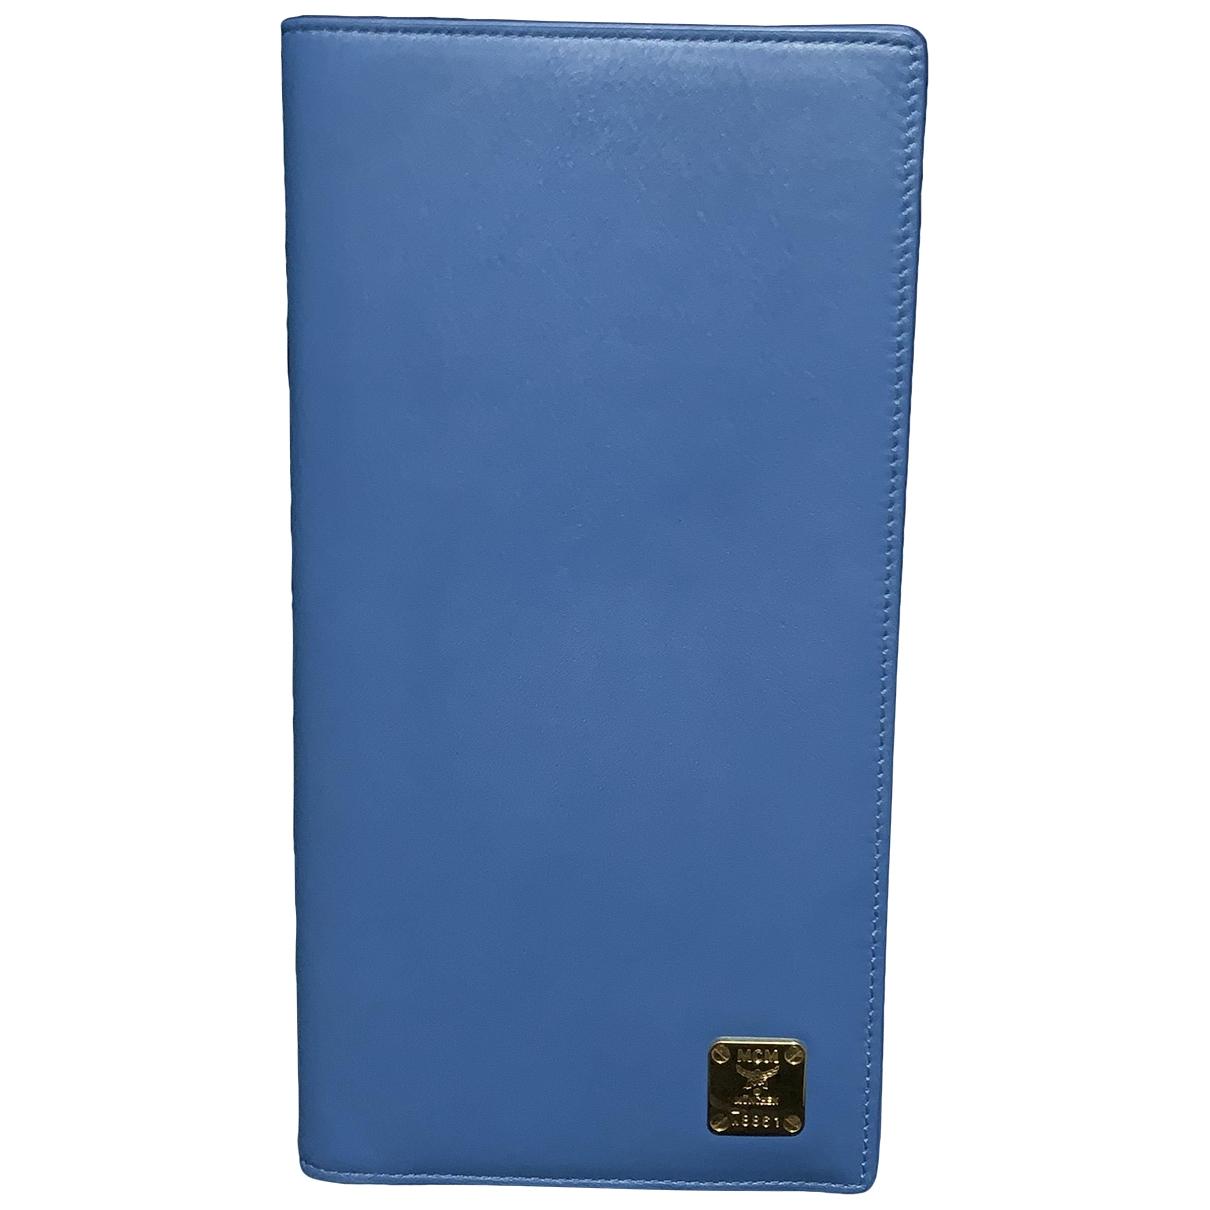 Mcm \N Blue Leather wallet for Women \N